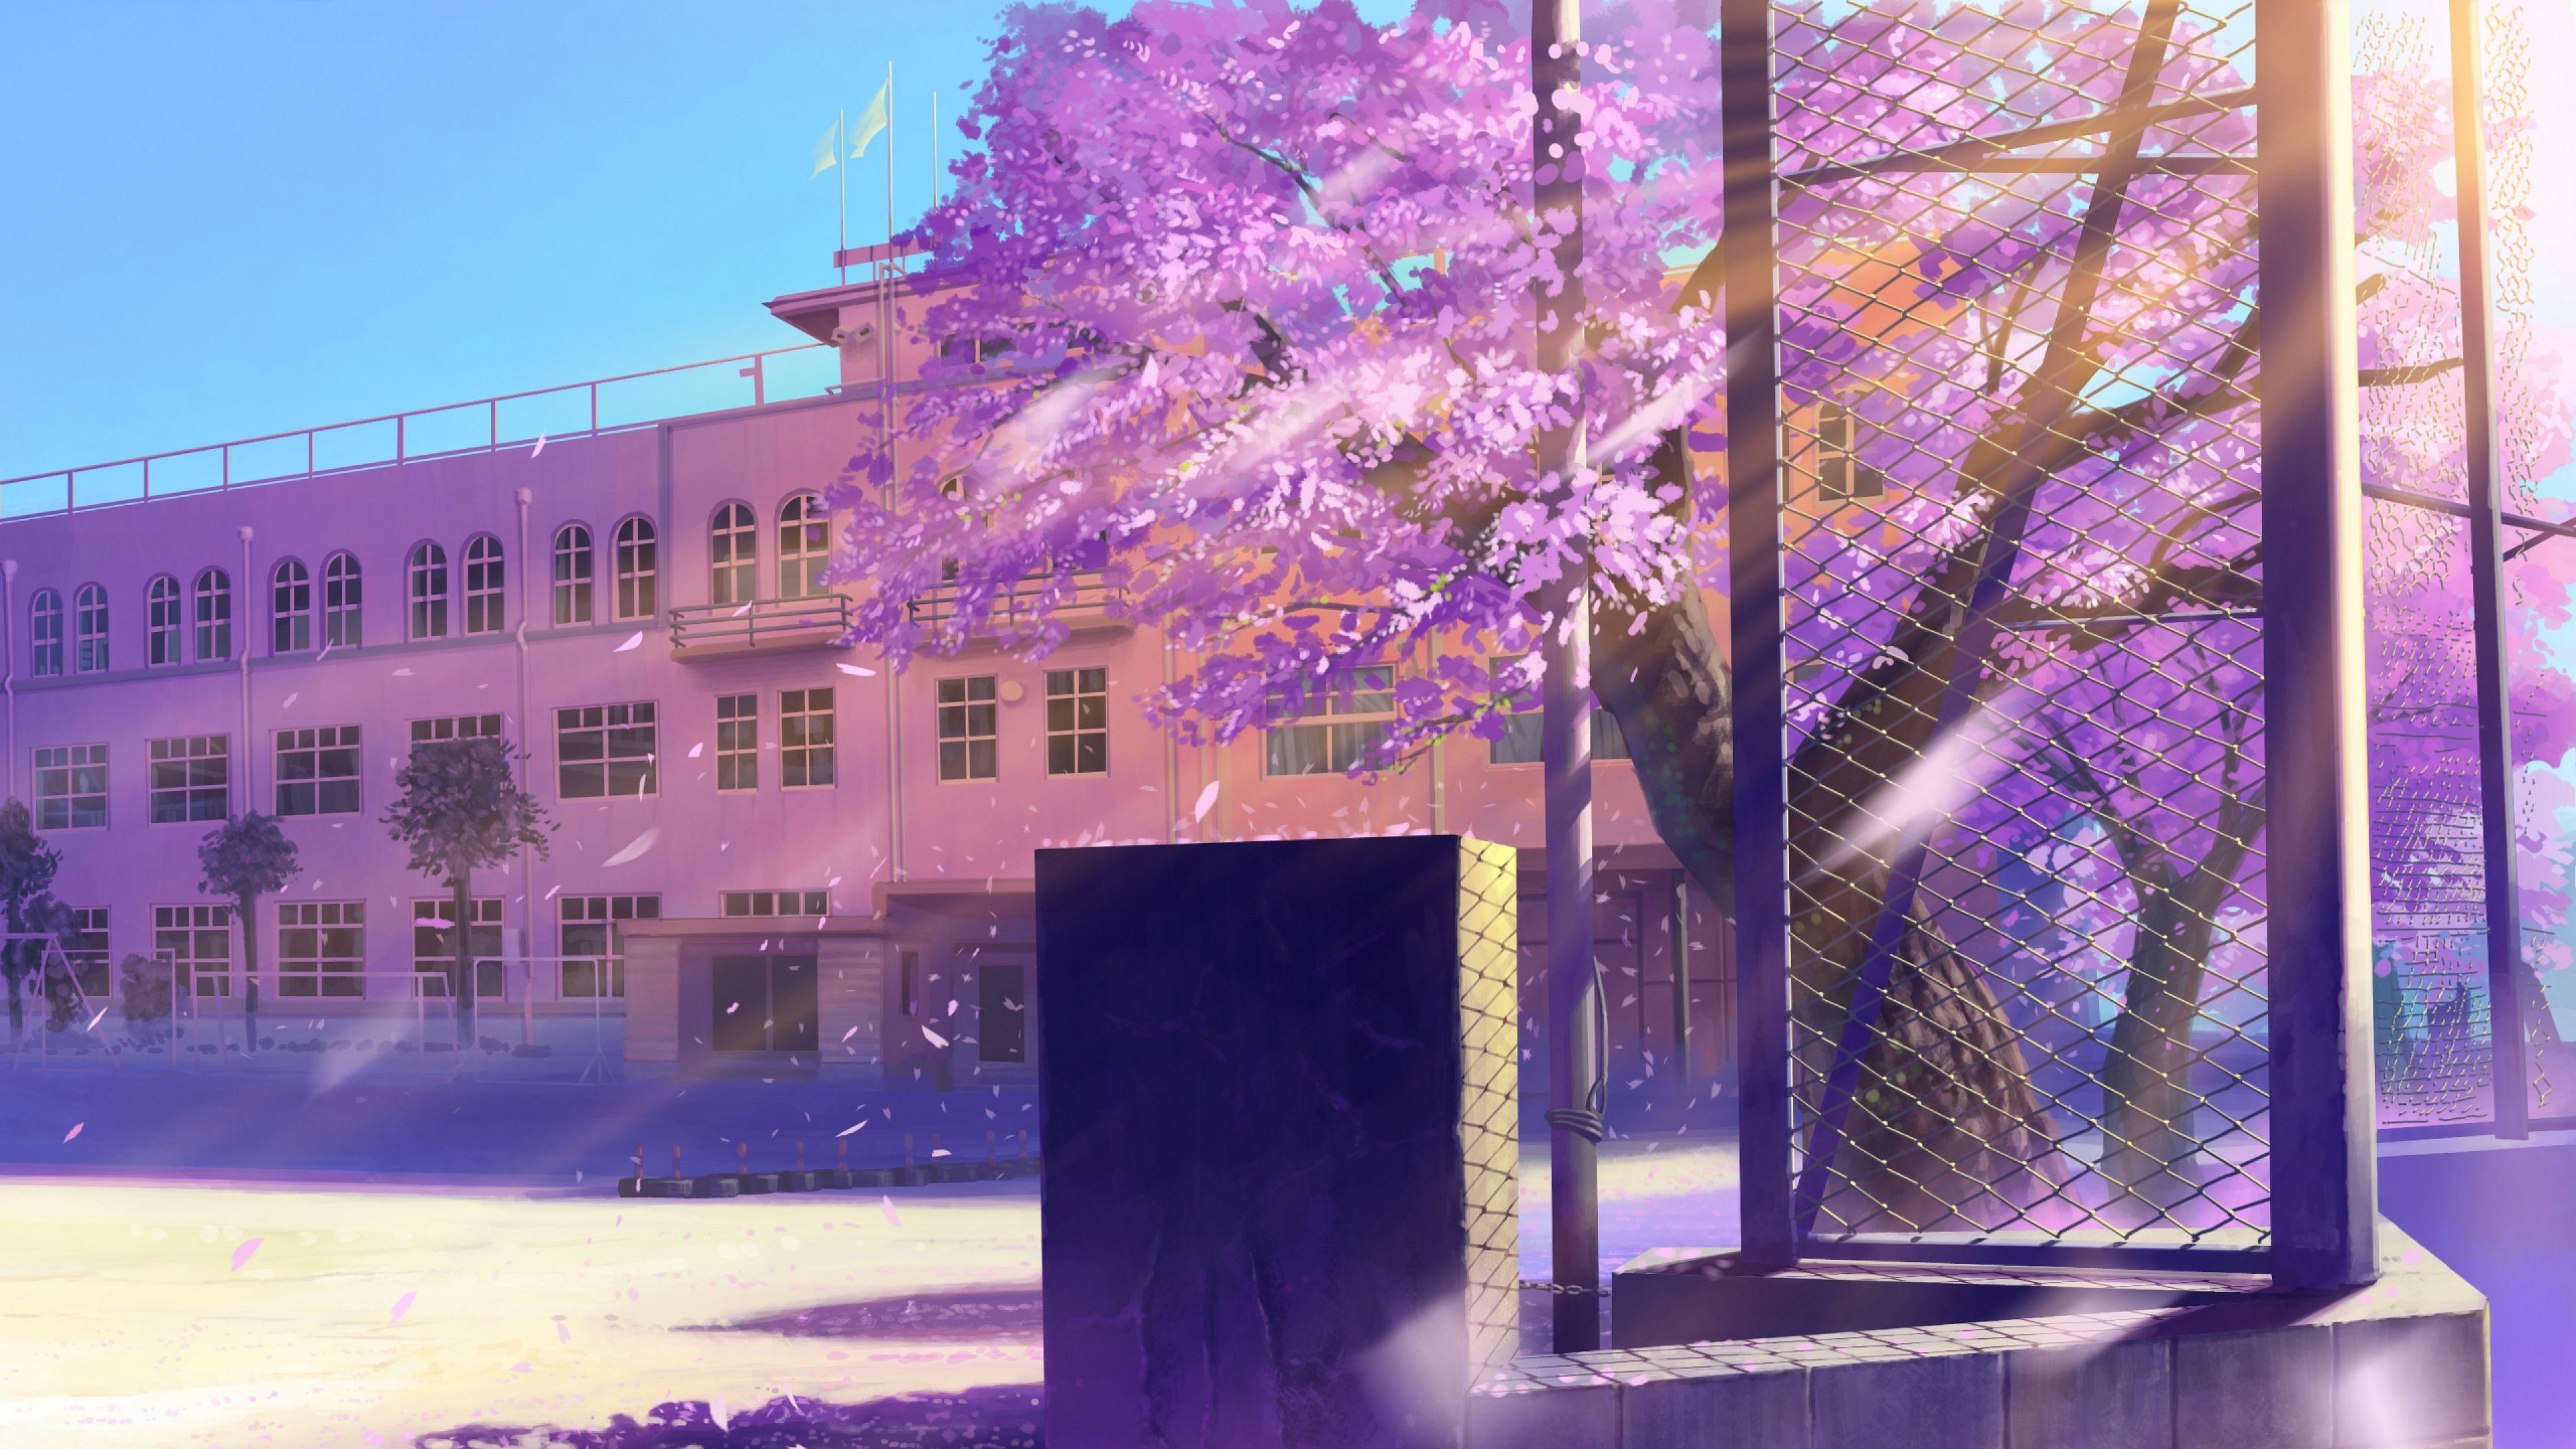 Fantastic Wallpaper Anime Aesthetic - d02868f75af7cc007f4a06c04a74e5ff  Snapshot_772274      .jpg